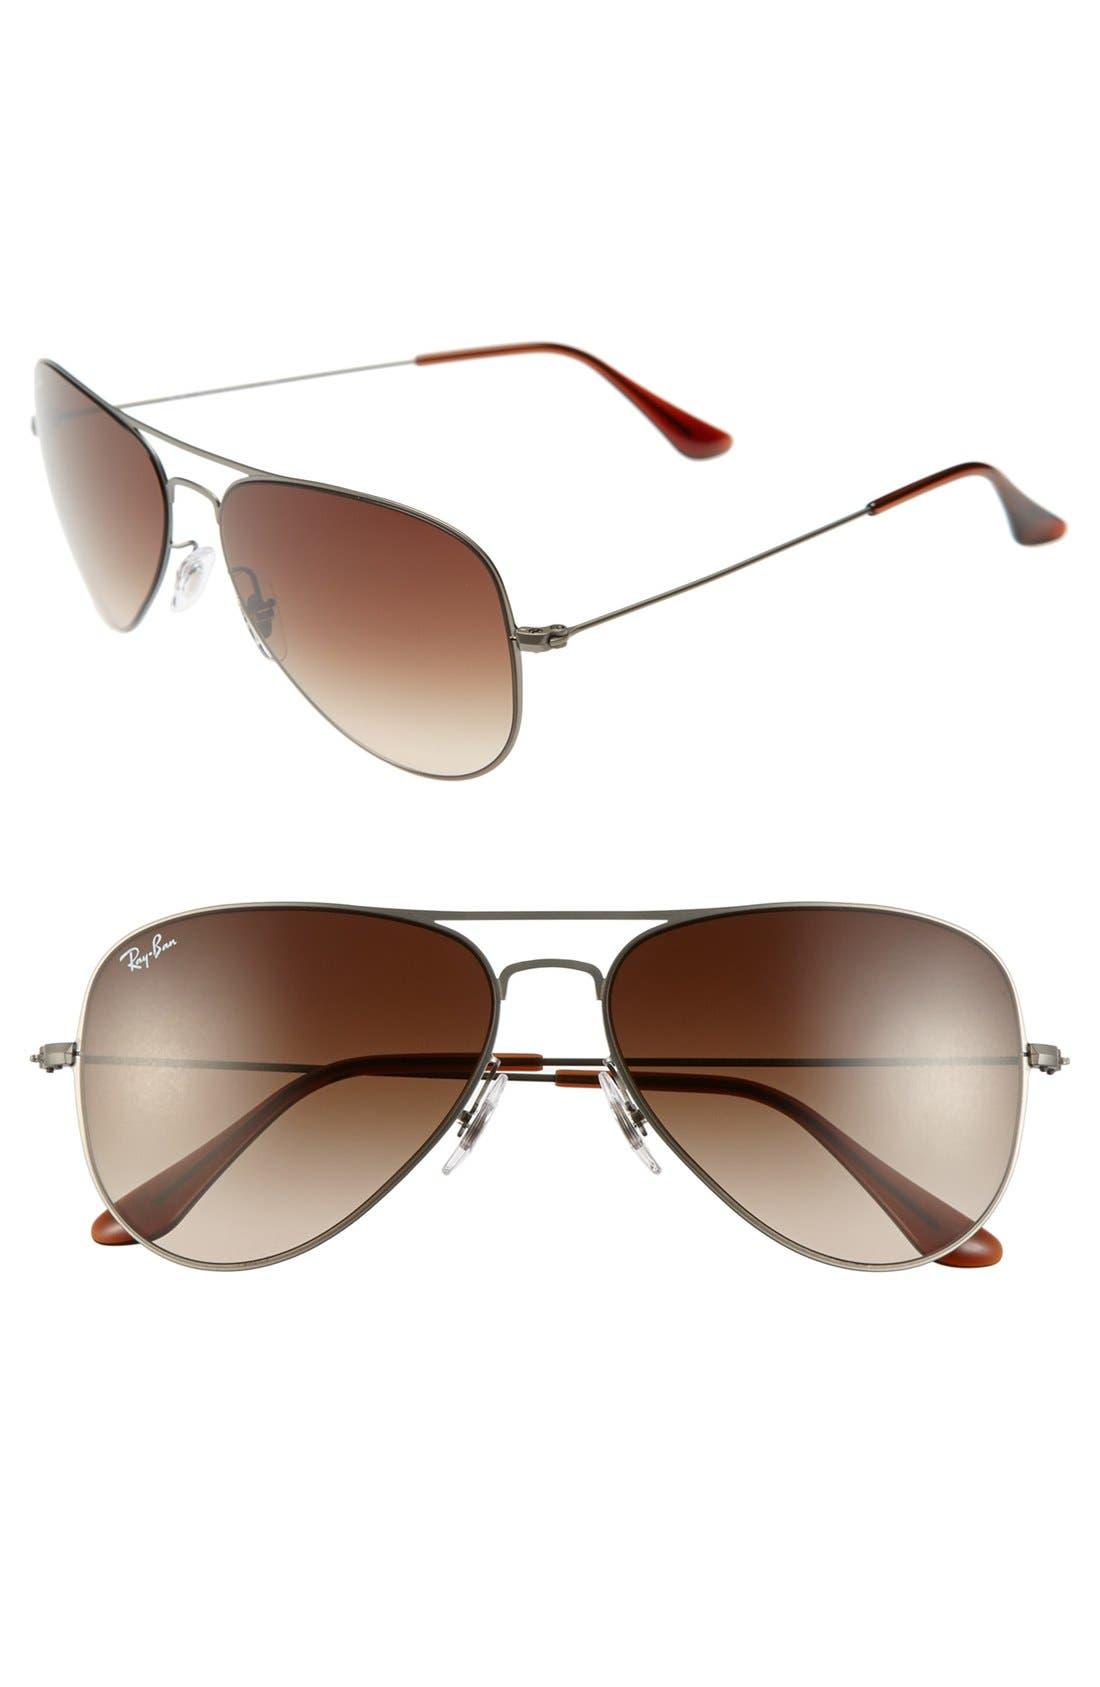 58mm Steel Aviator Sunglasses,                             Main thumbnail 1, color,                             064